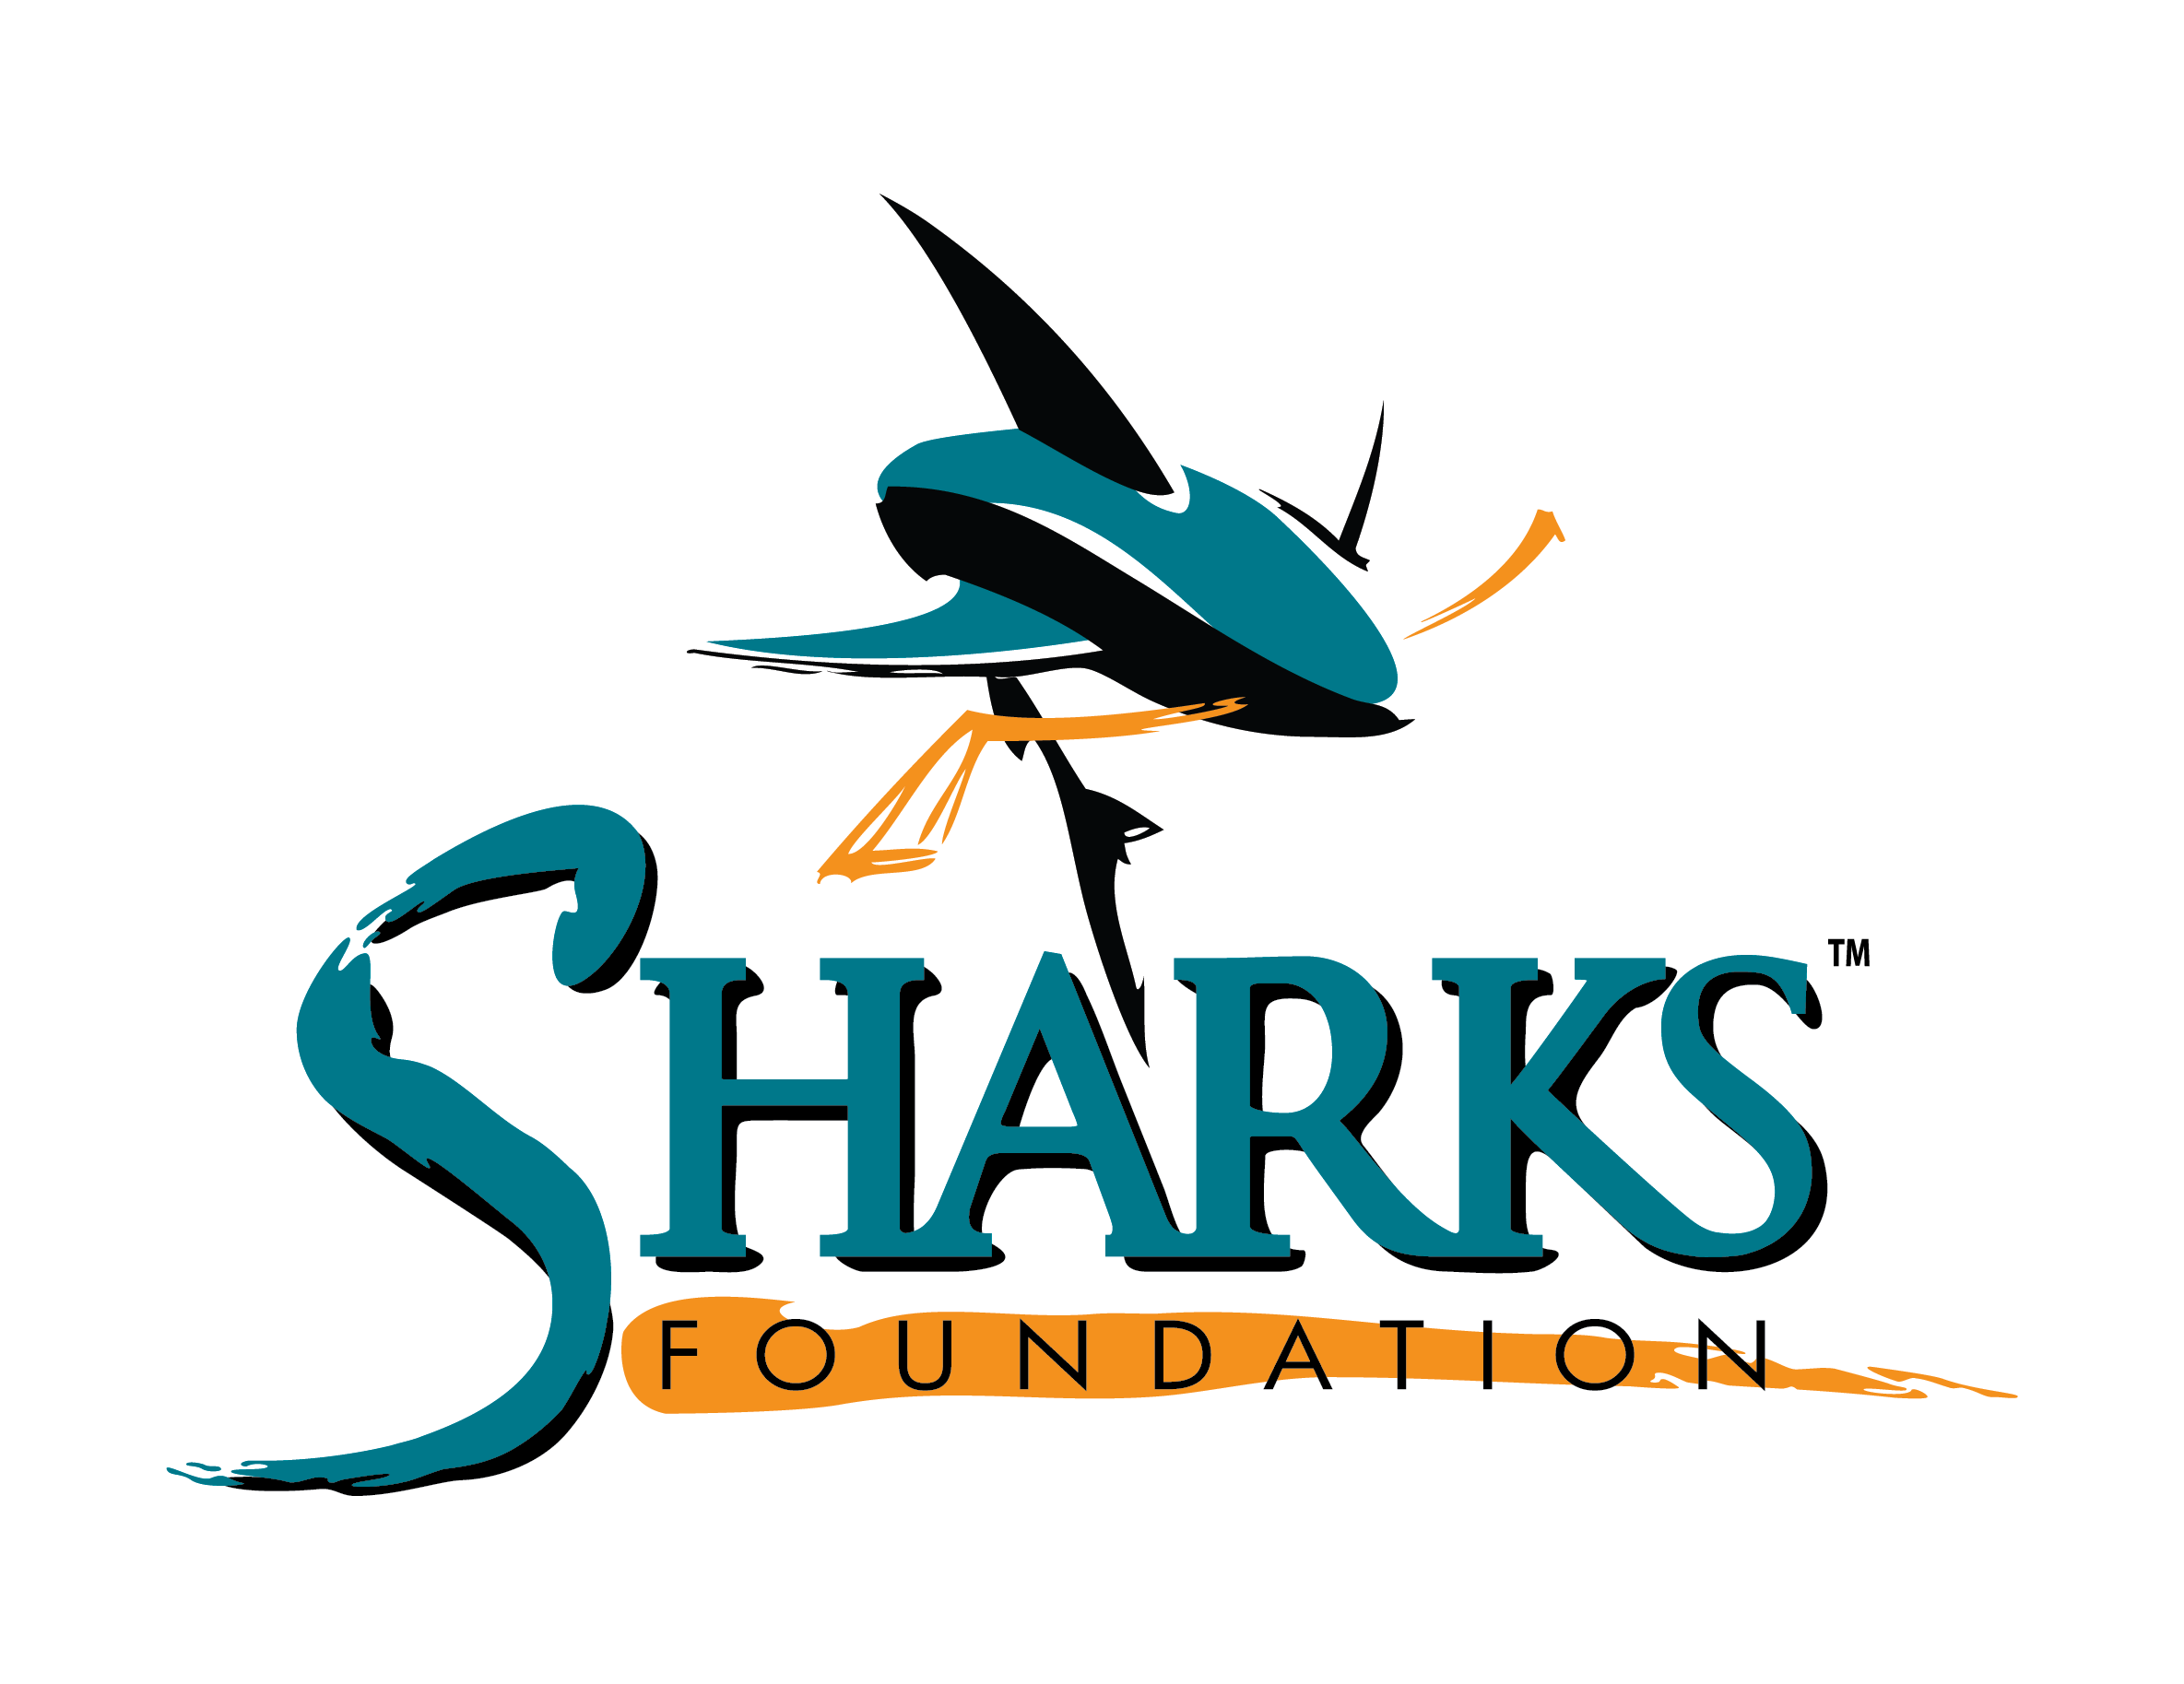 SharksFoundation_Teal_Stacked-02.png